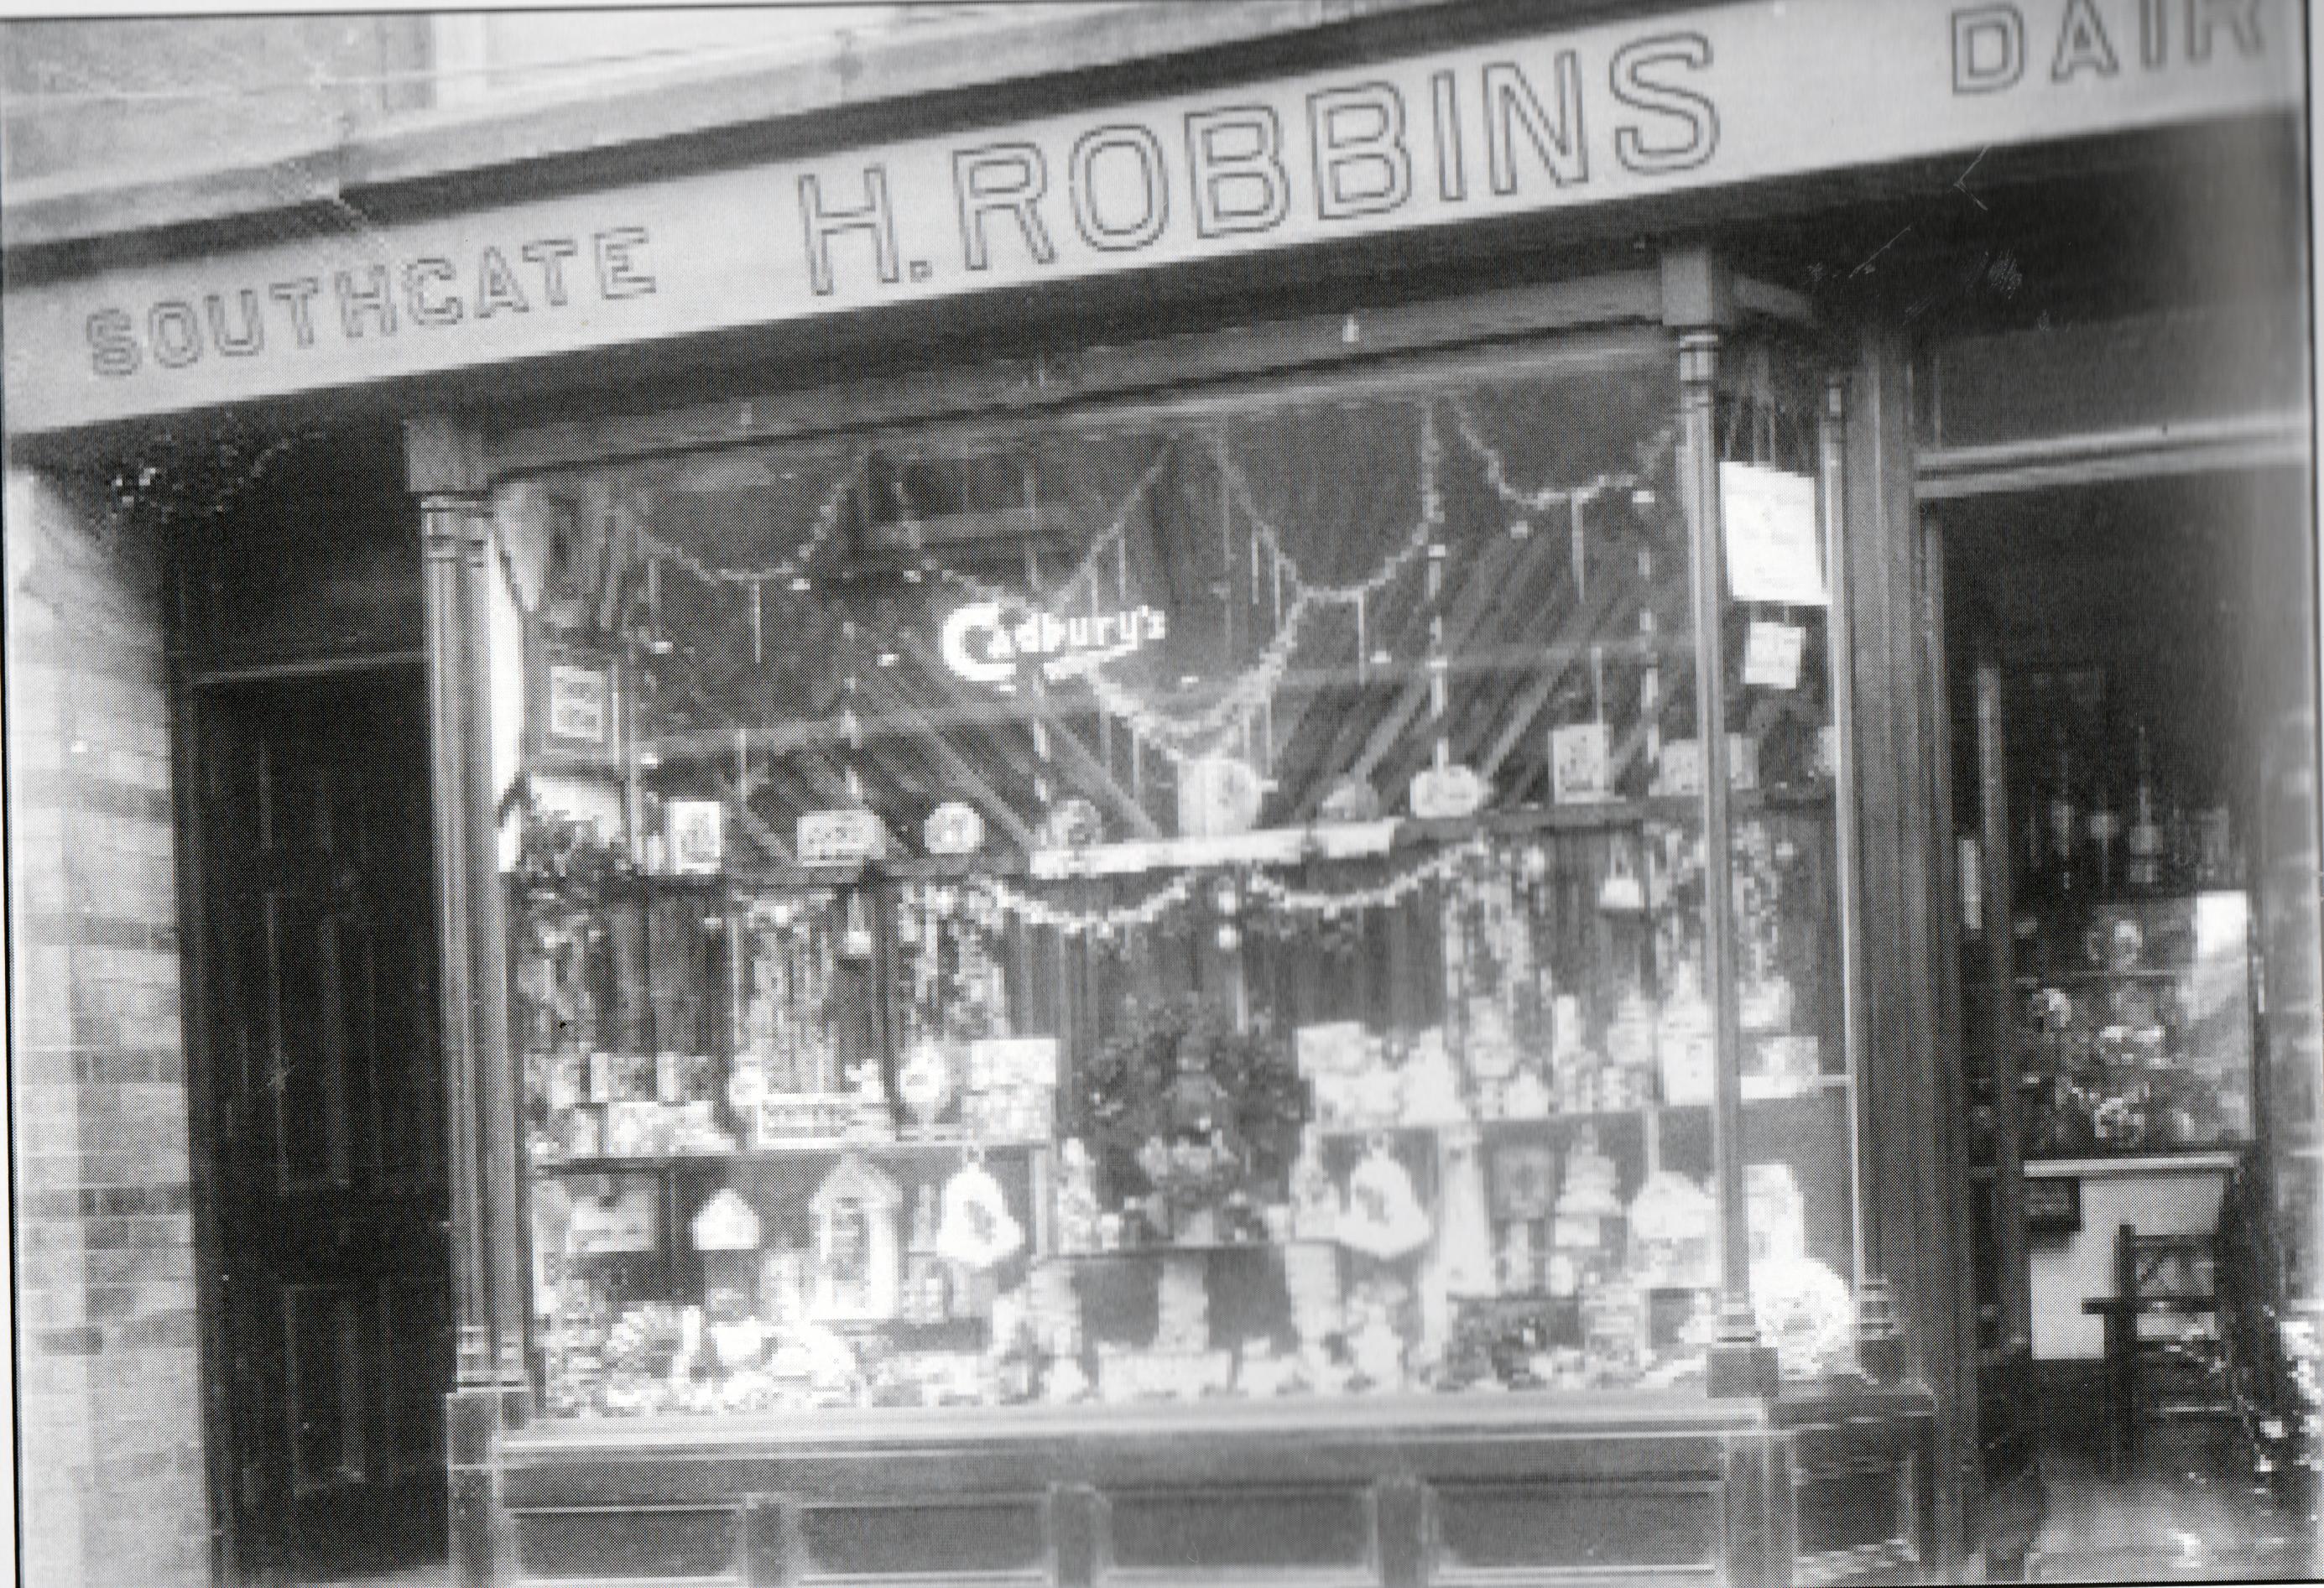 H. Robbins, 16 Southgate Place.